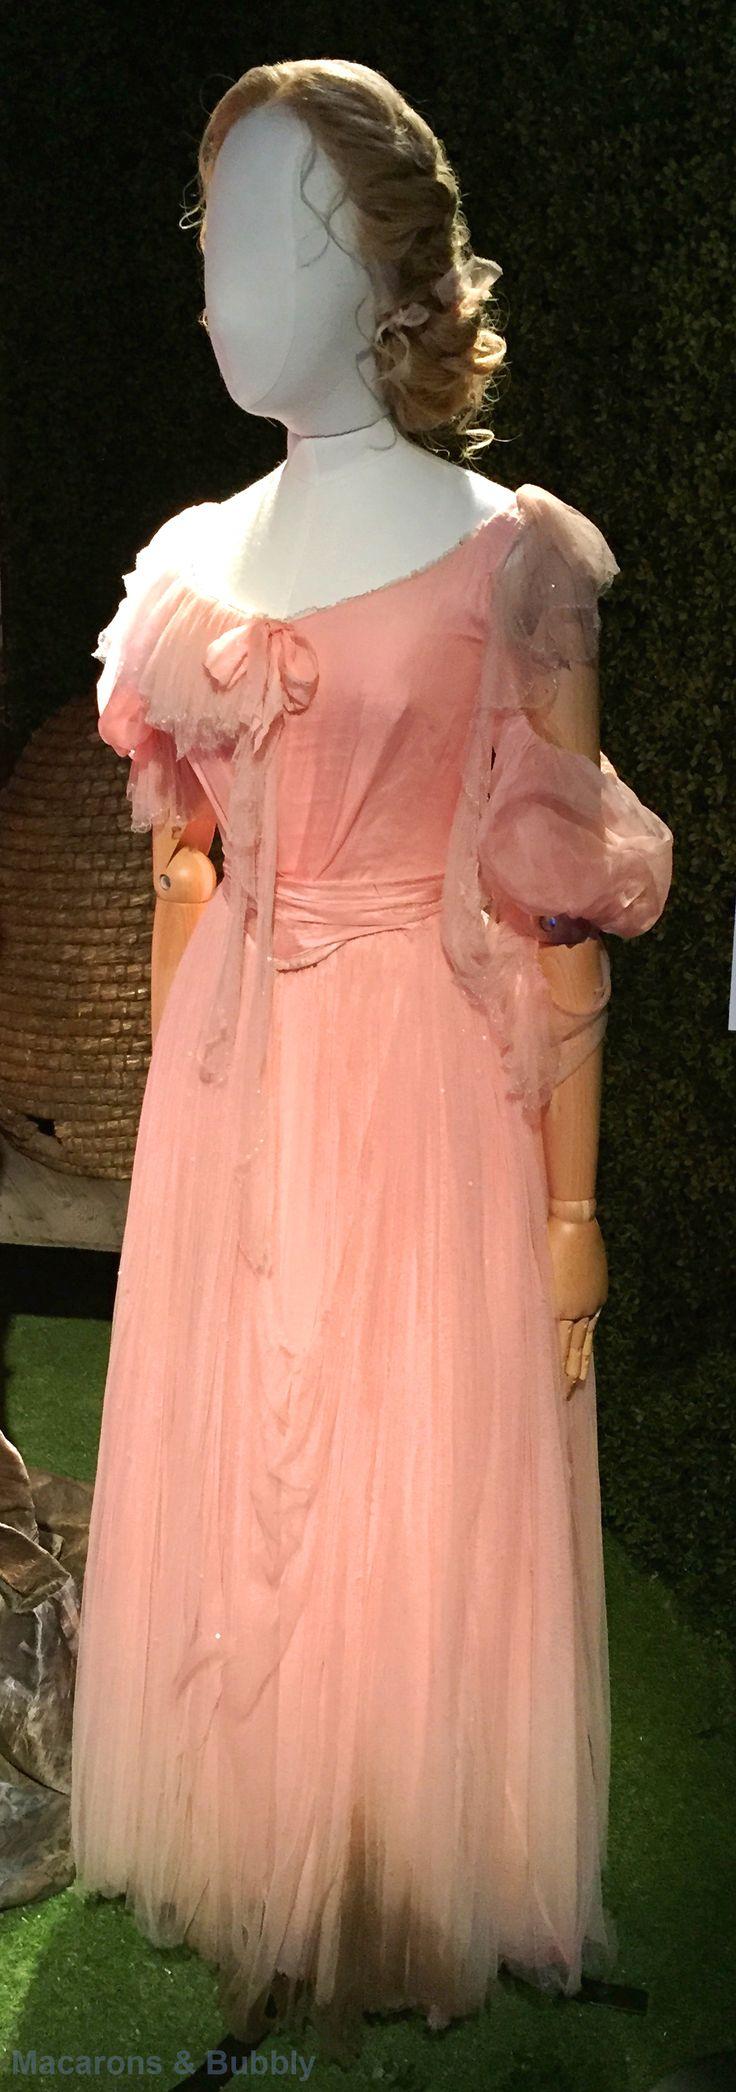 Cinderella 2015 Pink Dress Cinderella S Mothers Dress